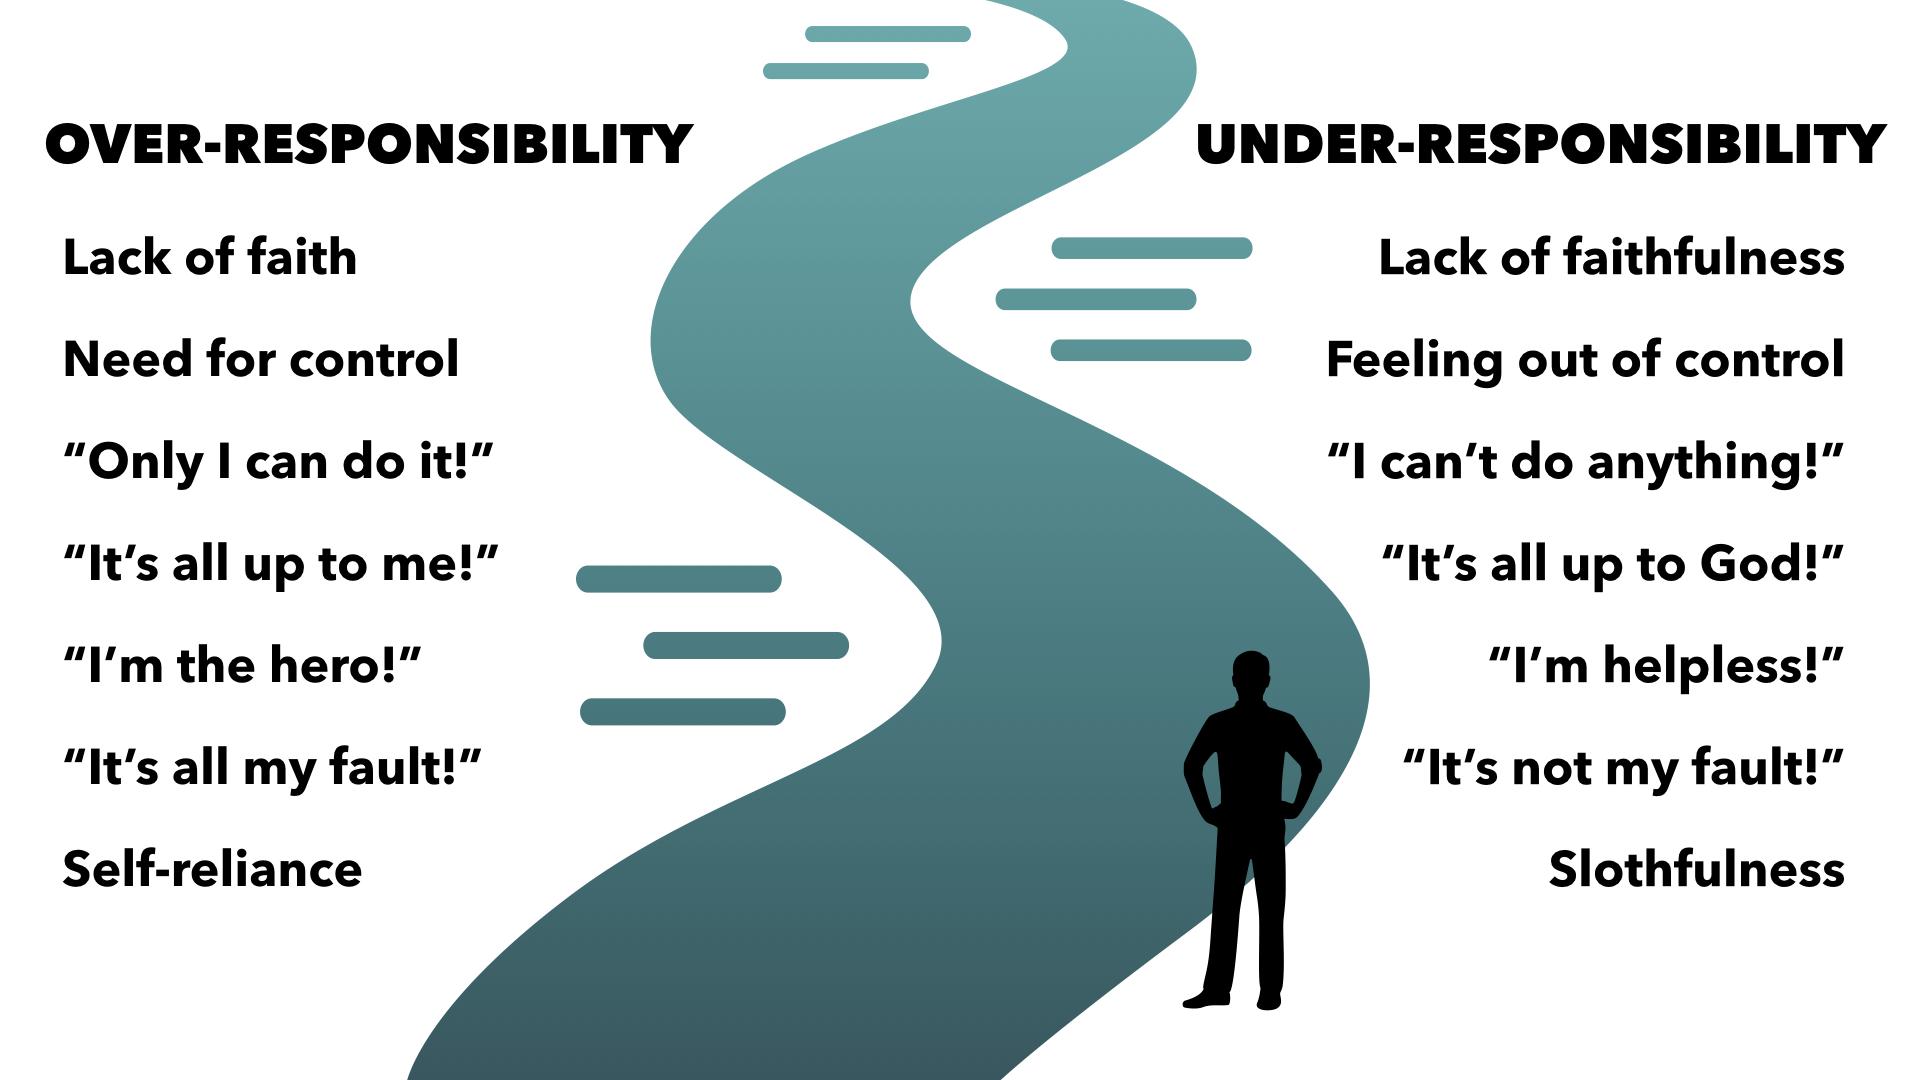 Over- vs Under-Responsibility